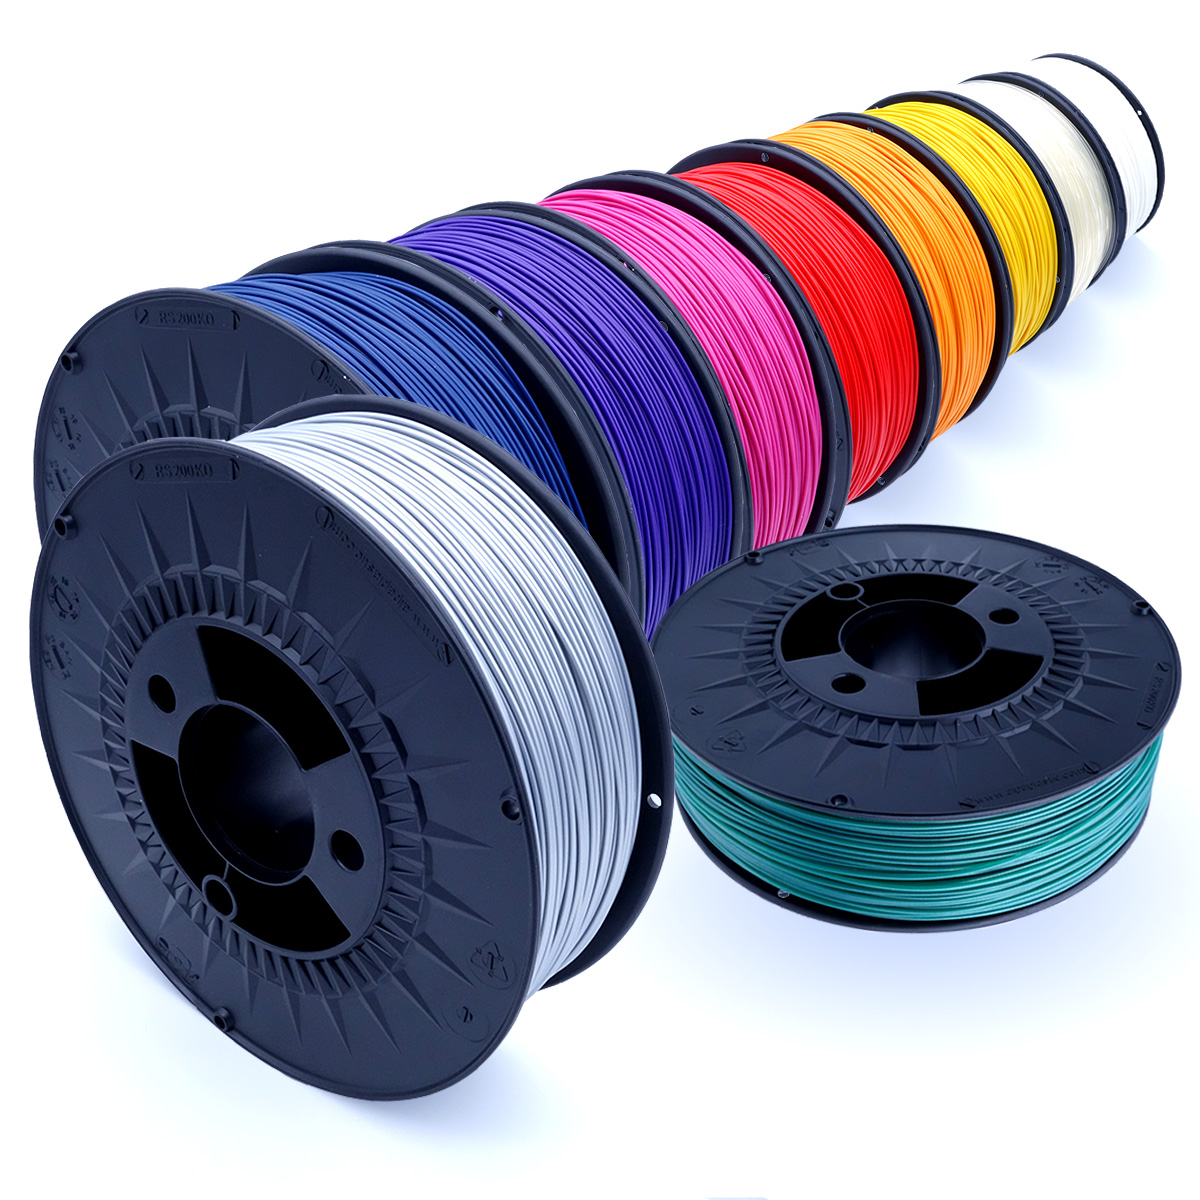 PLA PETG Filament Bundle or Prototyping Filament, starterset / -paket